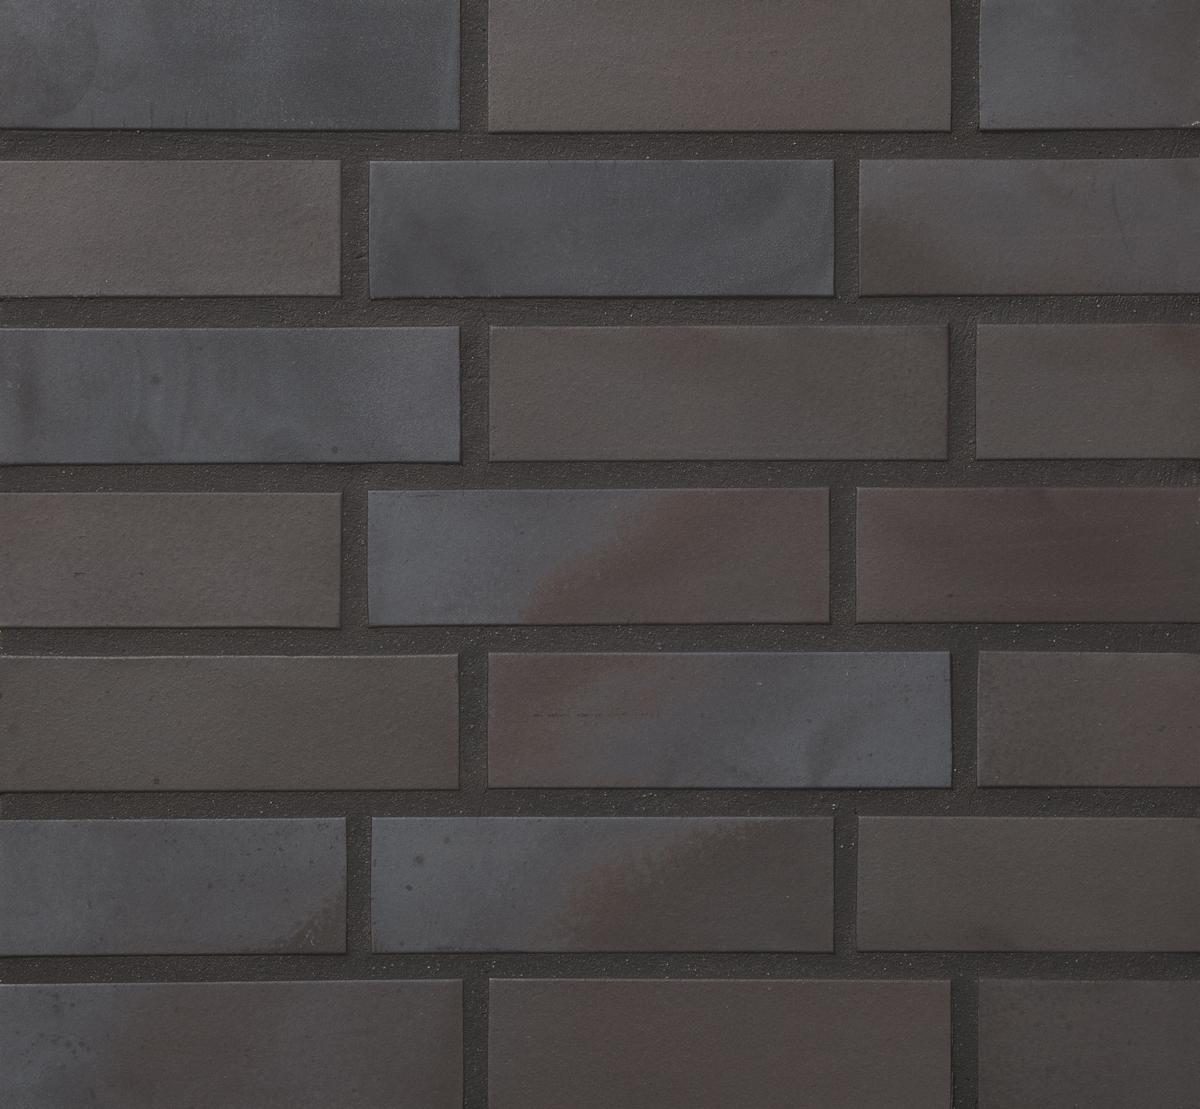 Keravette Metallic Black 240x71x11 cm